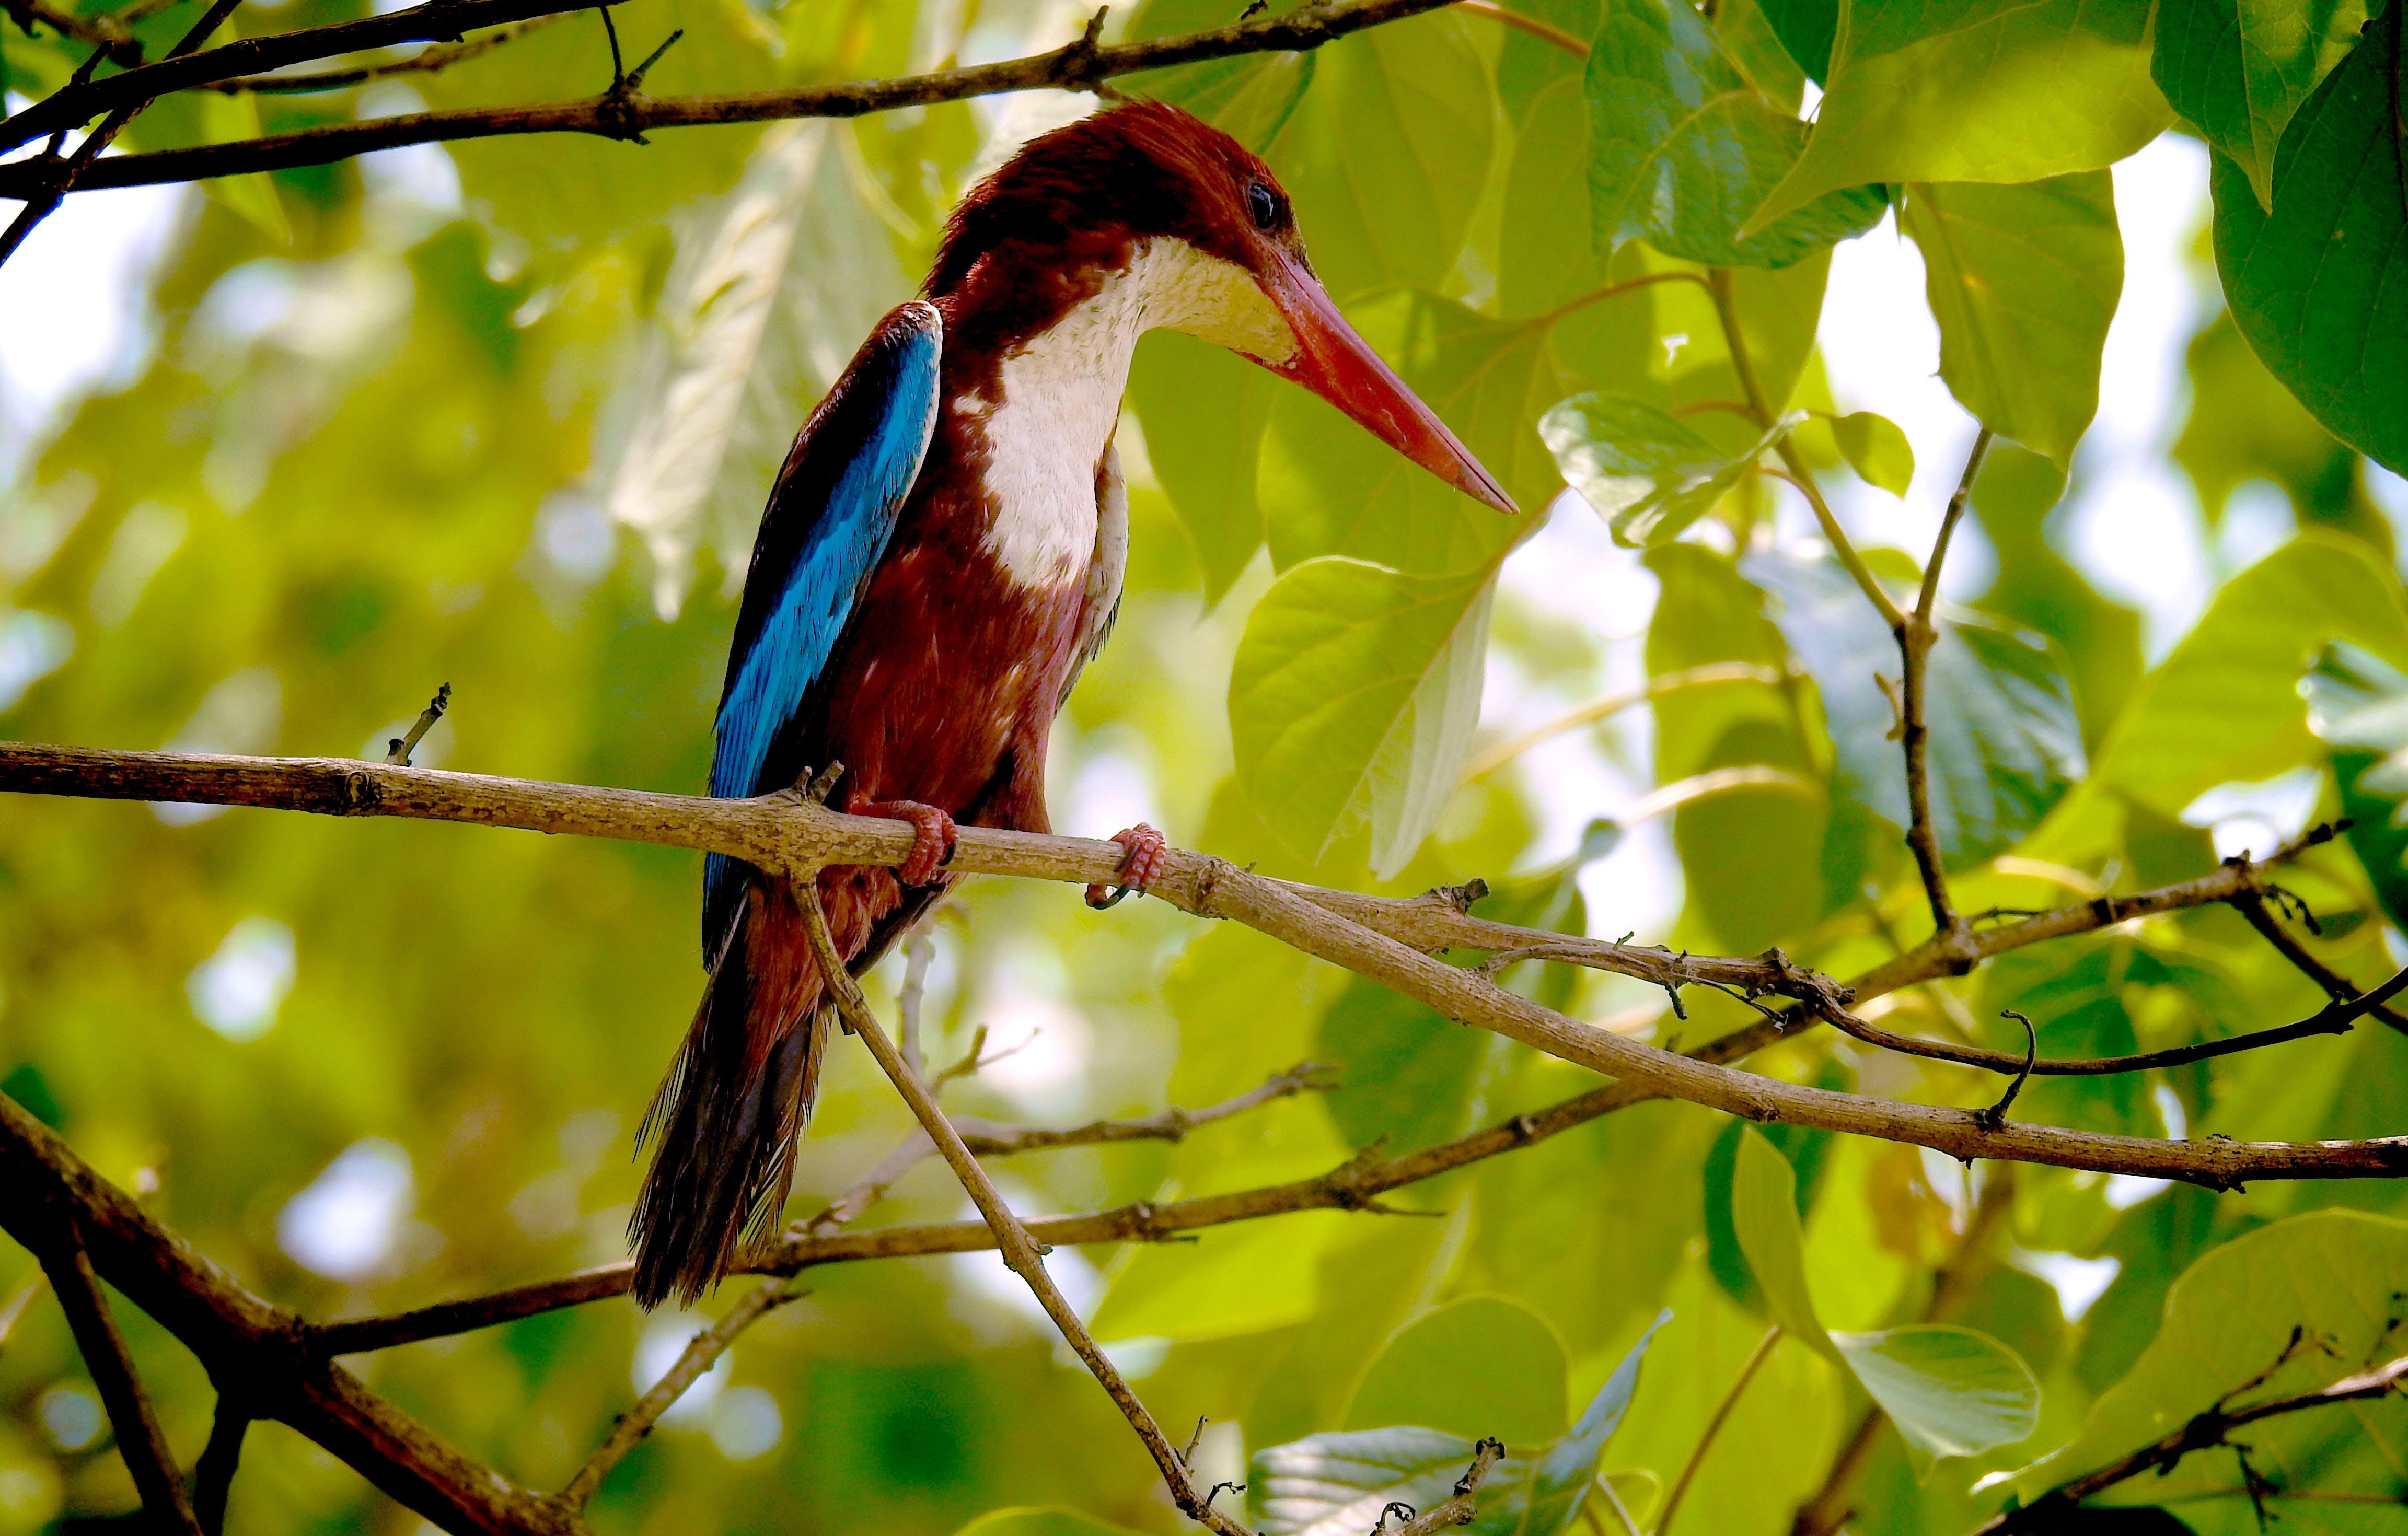 Brown Bird Perching on Tree